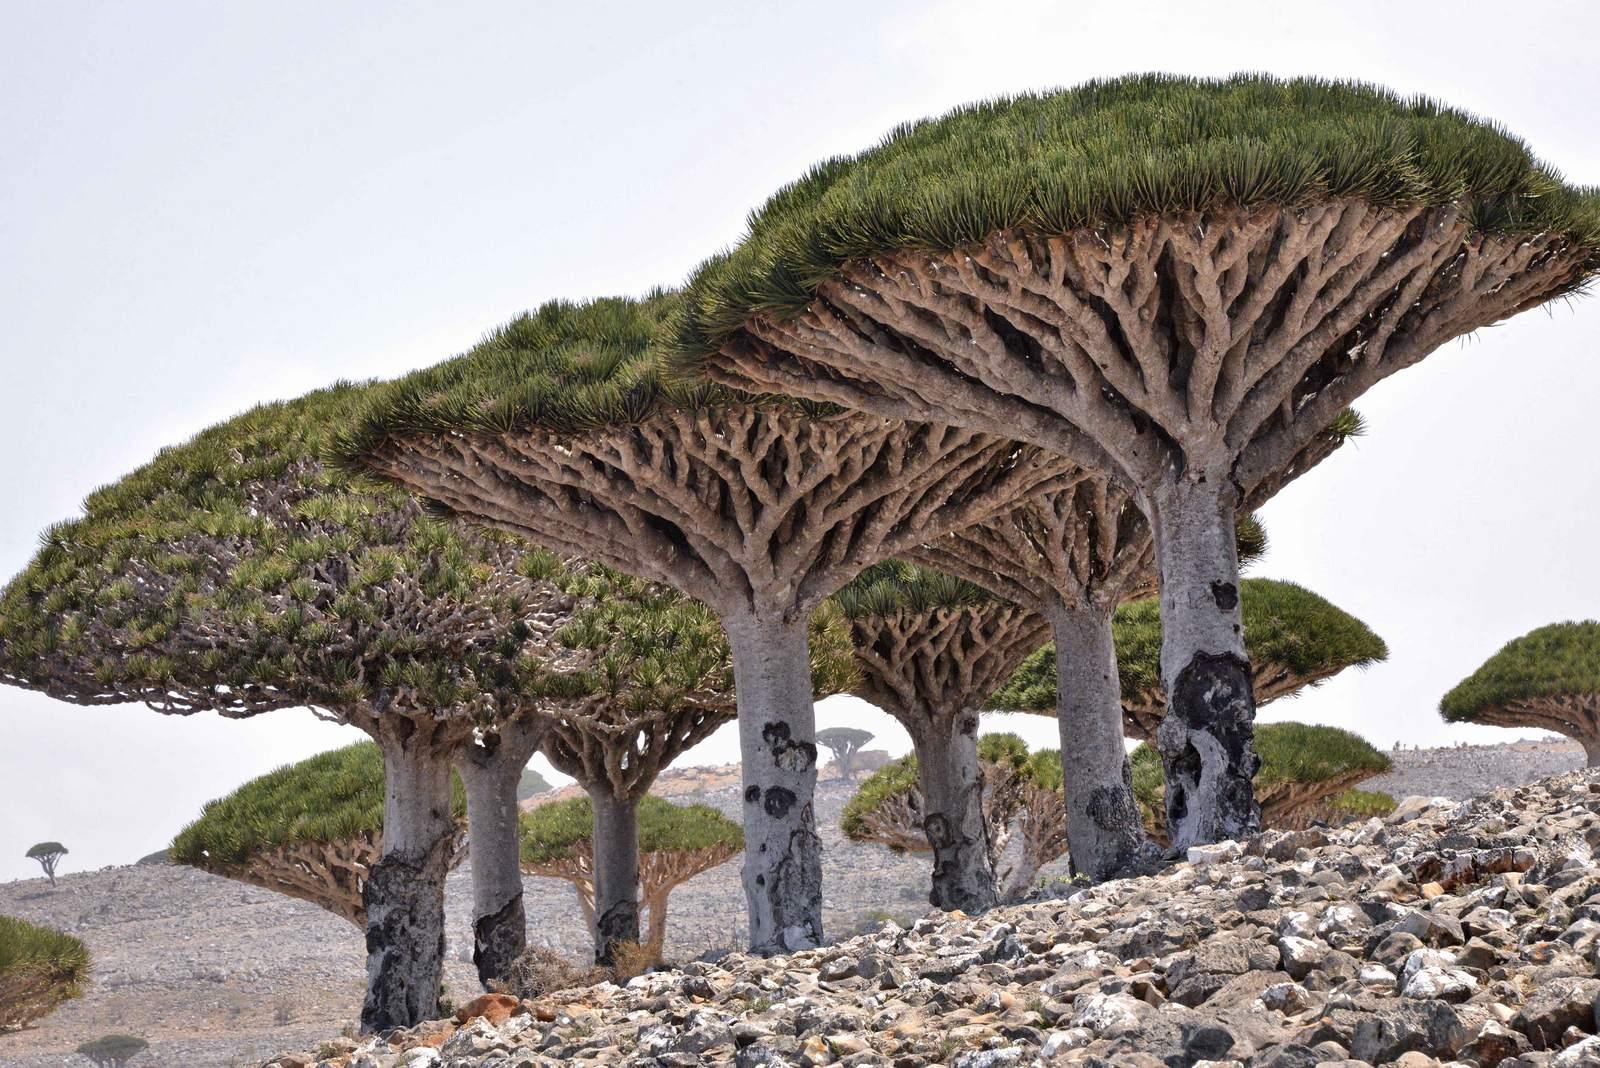 socotra4 Dragons Blood Tree at Socotra Island, Yemen